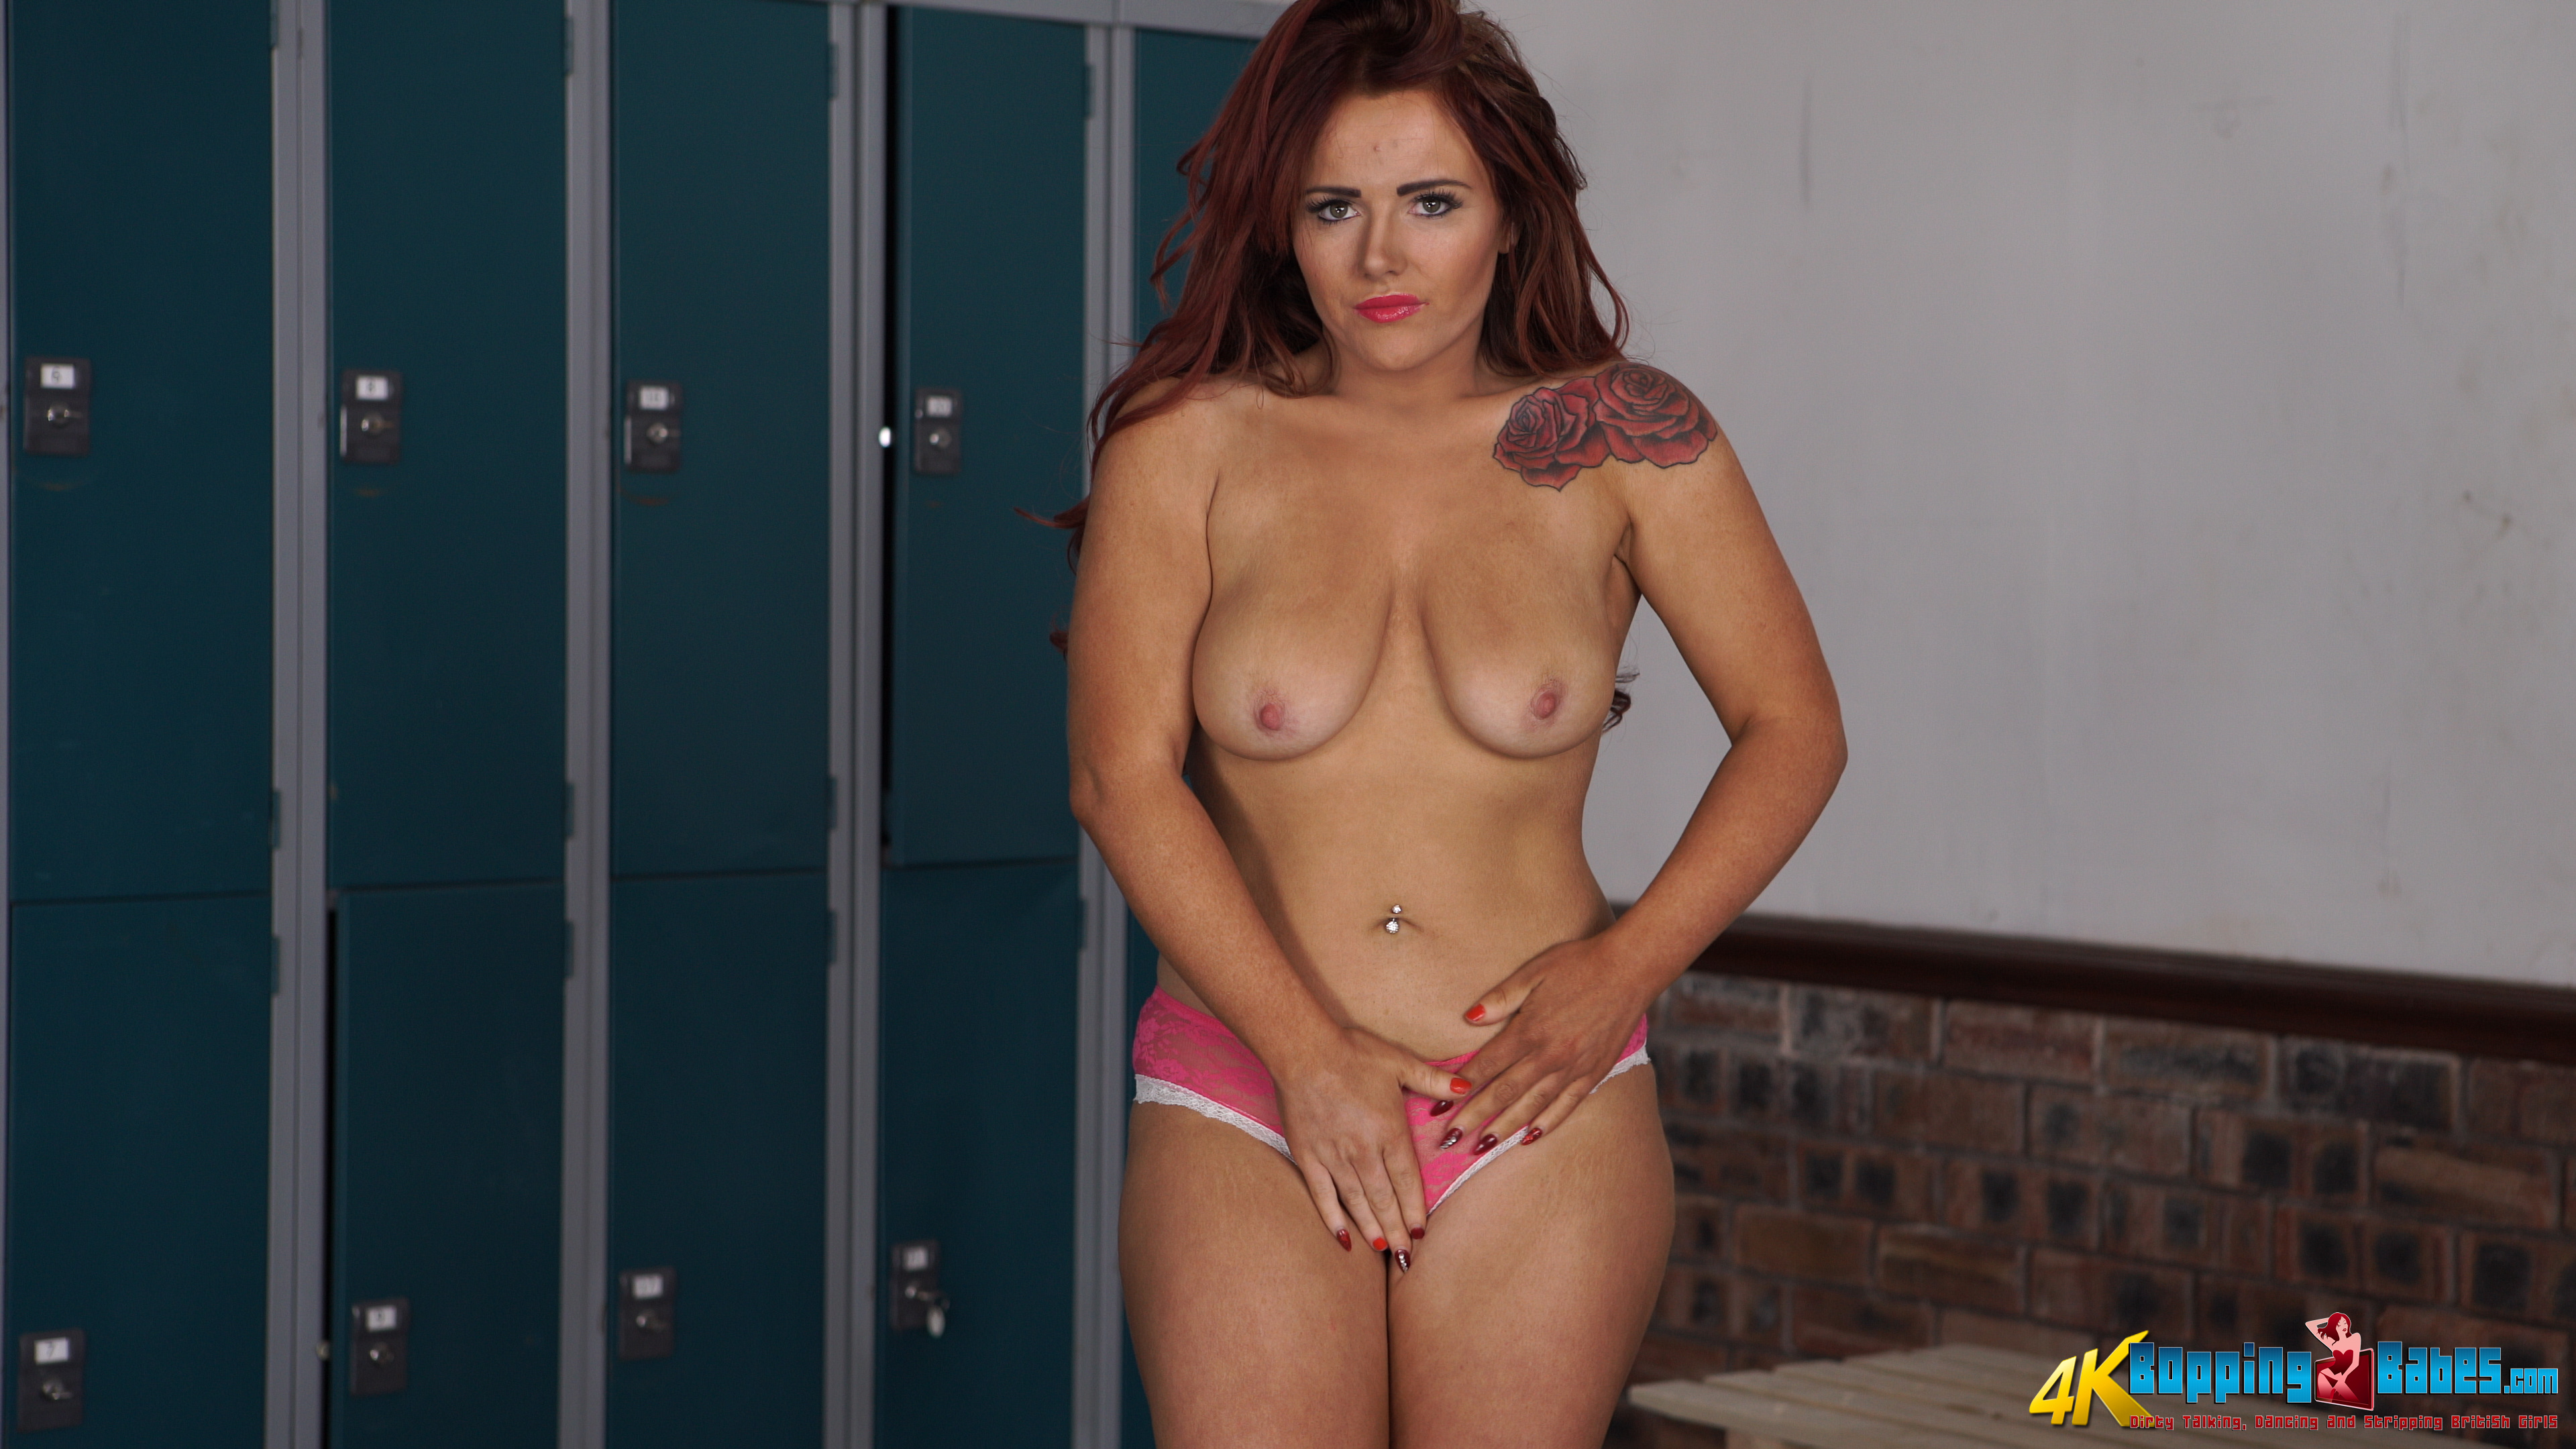 sexy curvy nude chicks